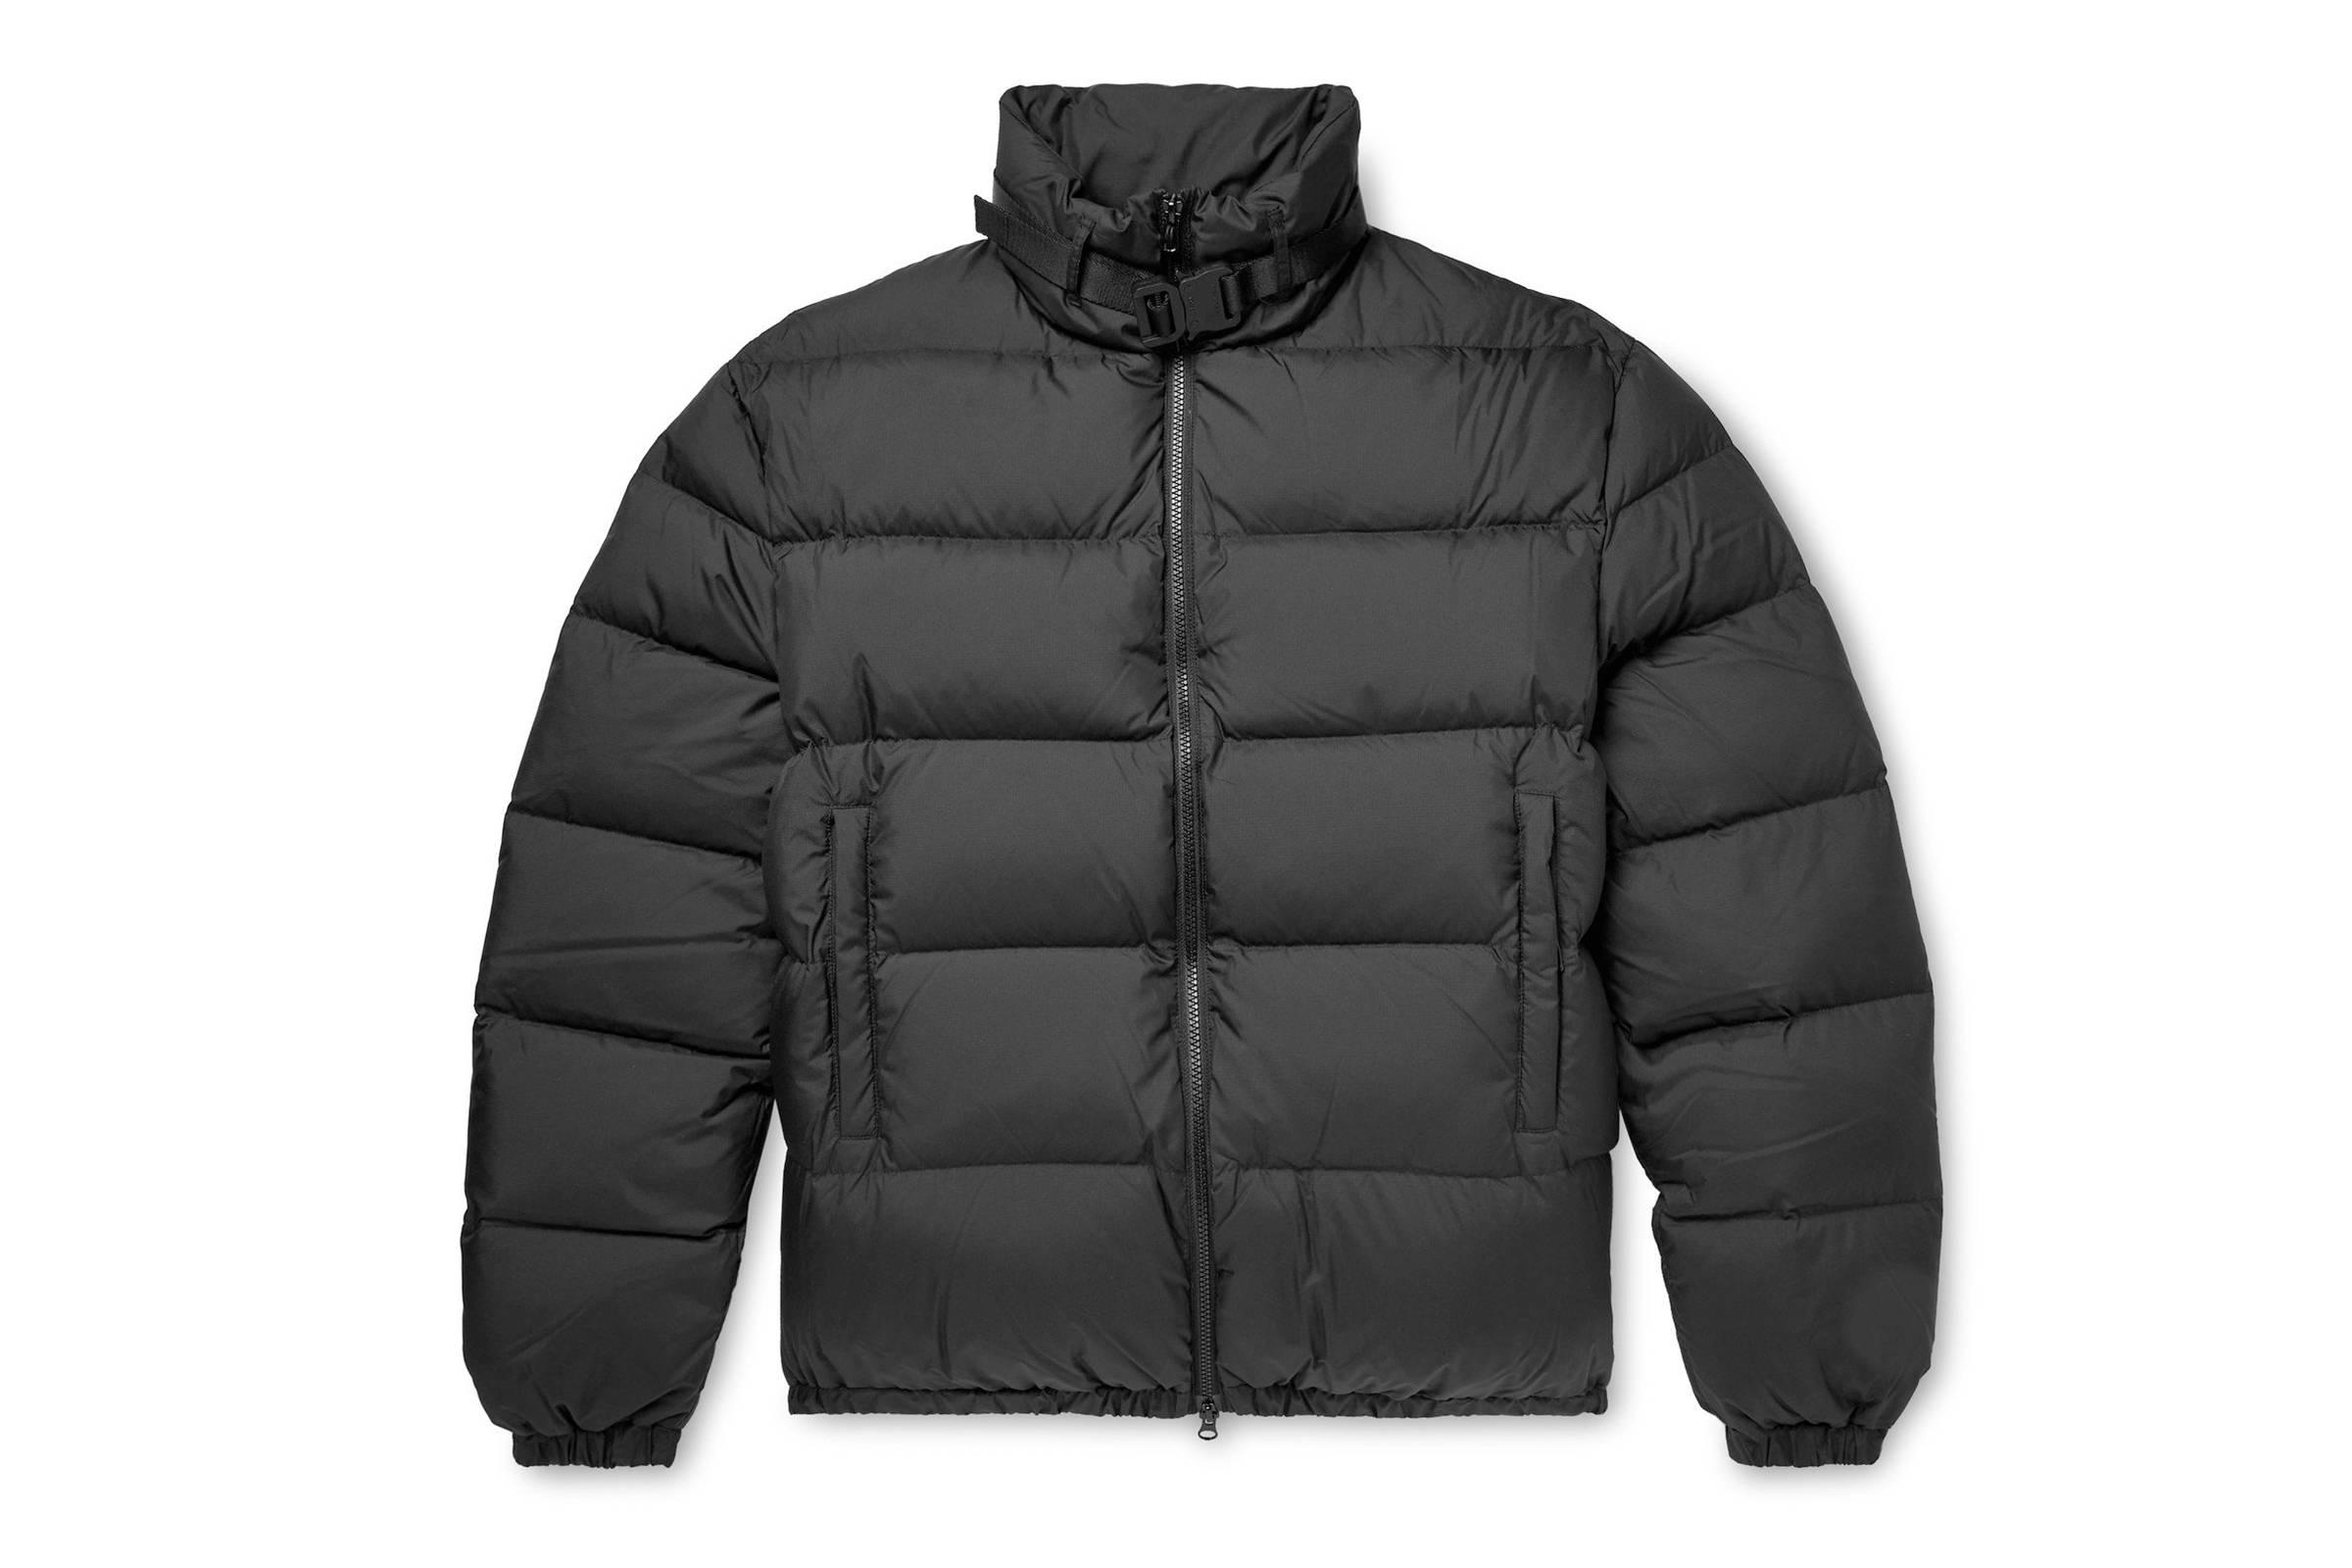 1017 ALYX 9SM Buckle Puffer Jacket